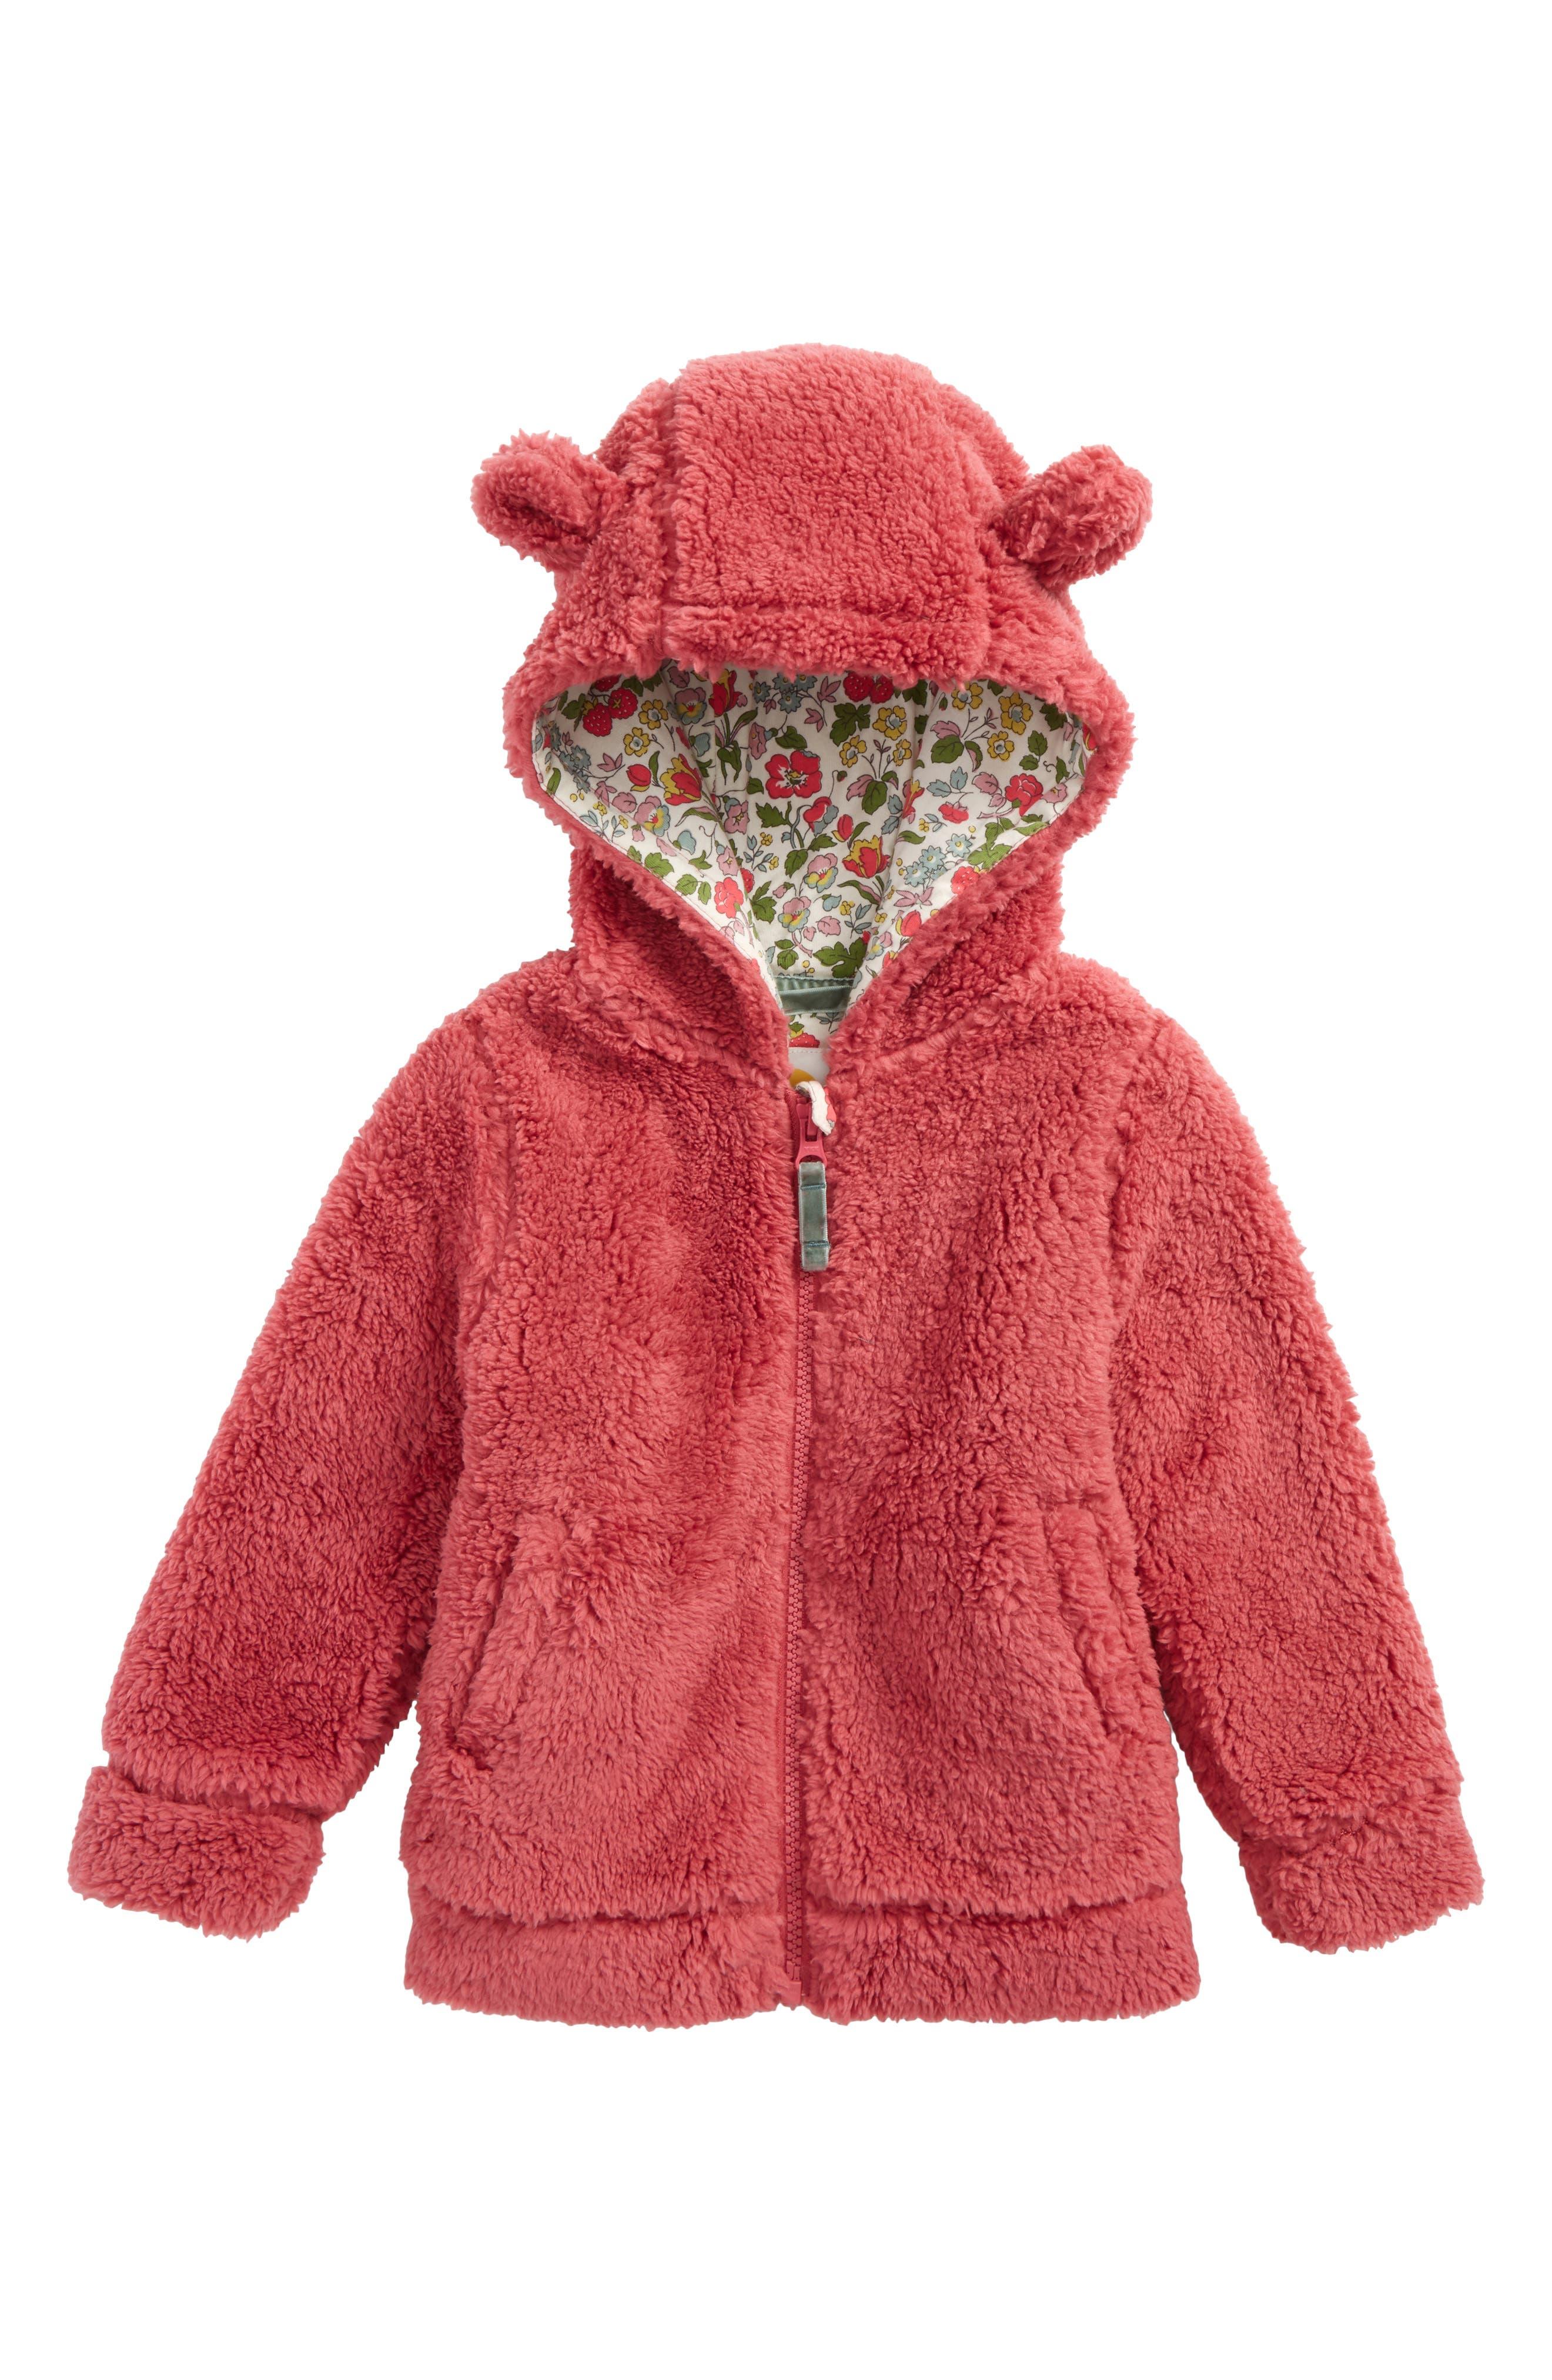 Alternate Image 1 Selected - Mini Boden Cosy Teddy Bear Hoodie (Toddler Girls, Little Girls & Big Girls)